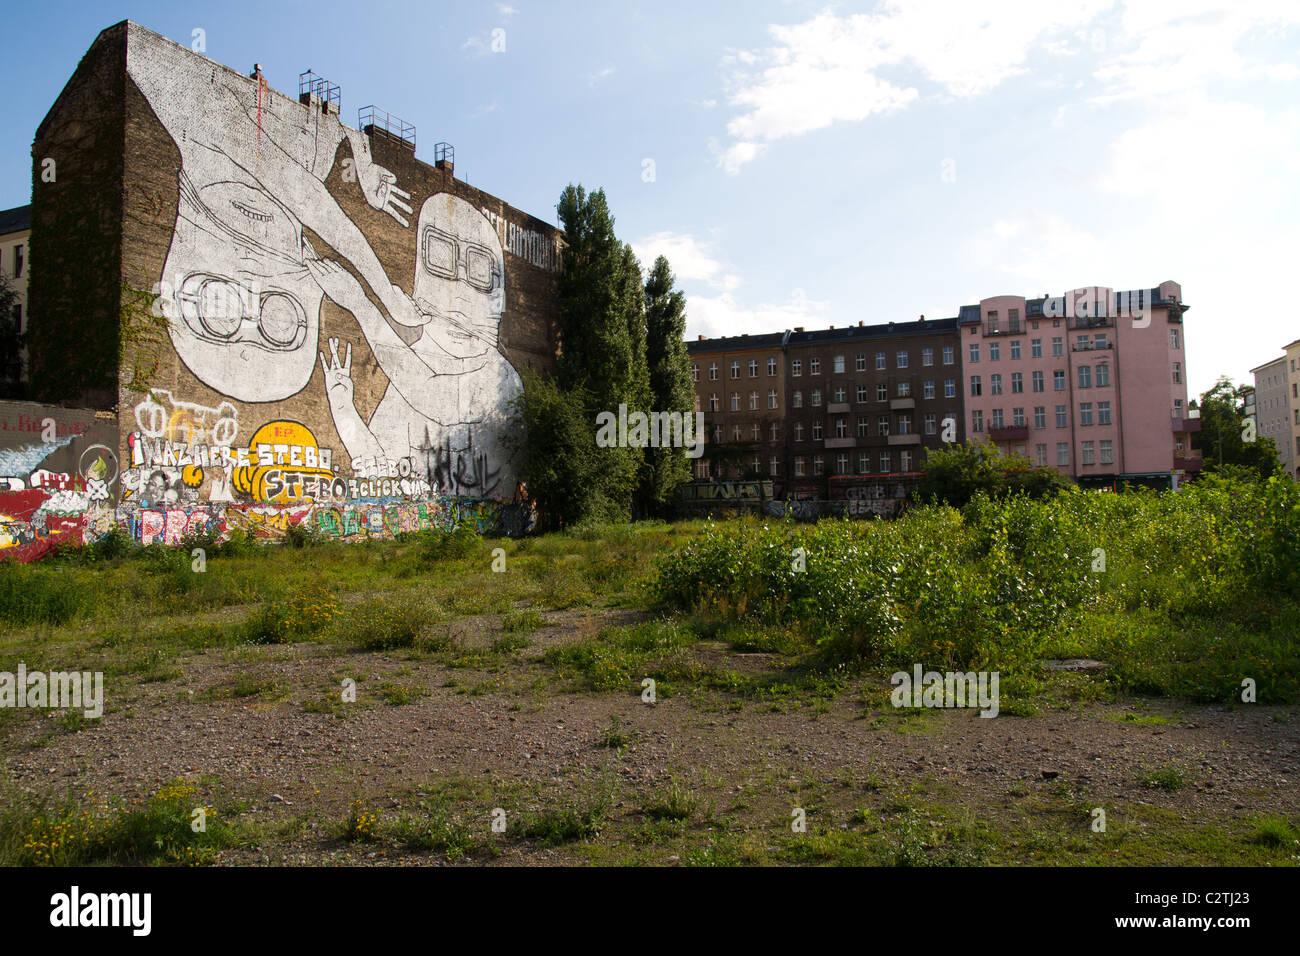 Giant streetart mural by artist Blu in Kreuzberg Berlin - Stock Image